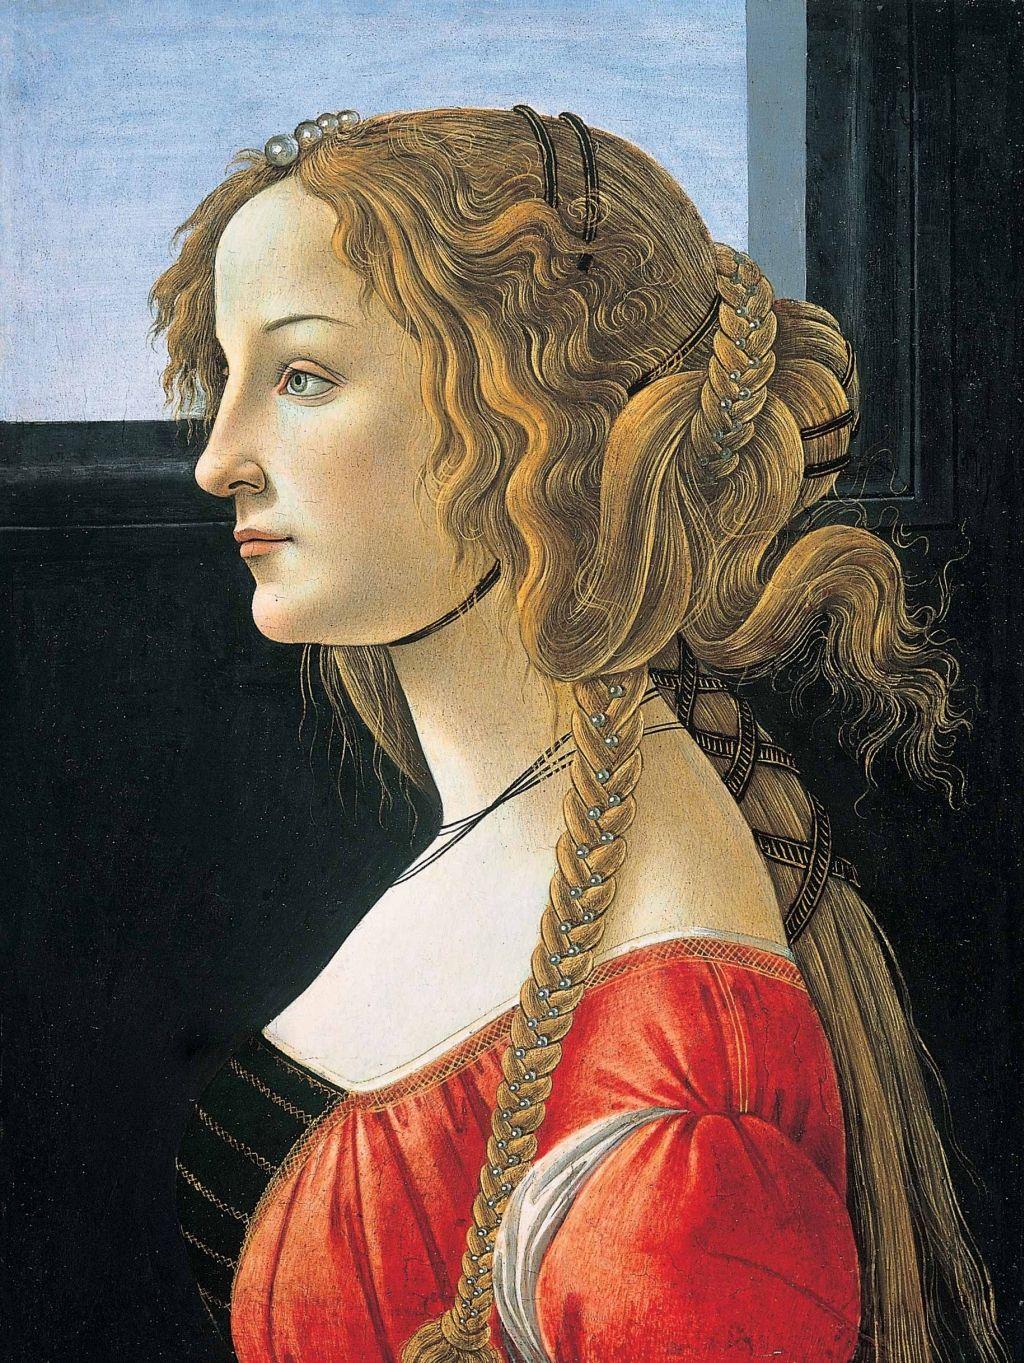 5 botticeli portrait painting by sandro botticelli